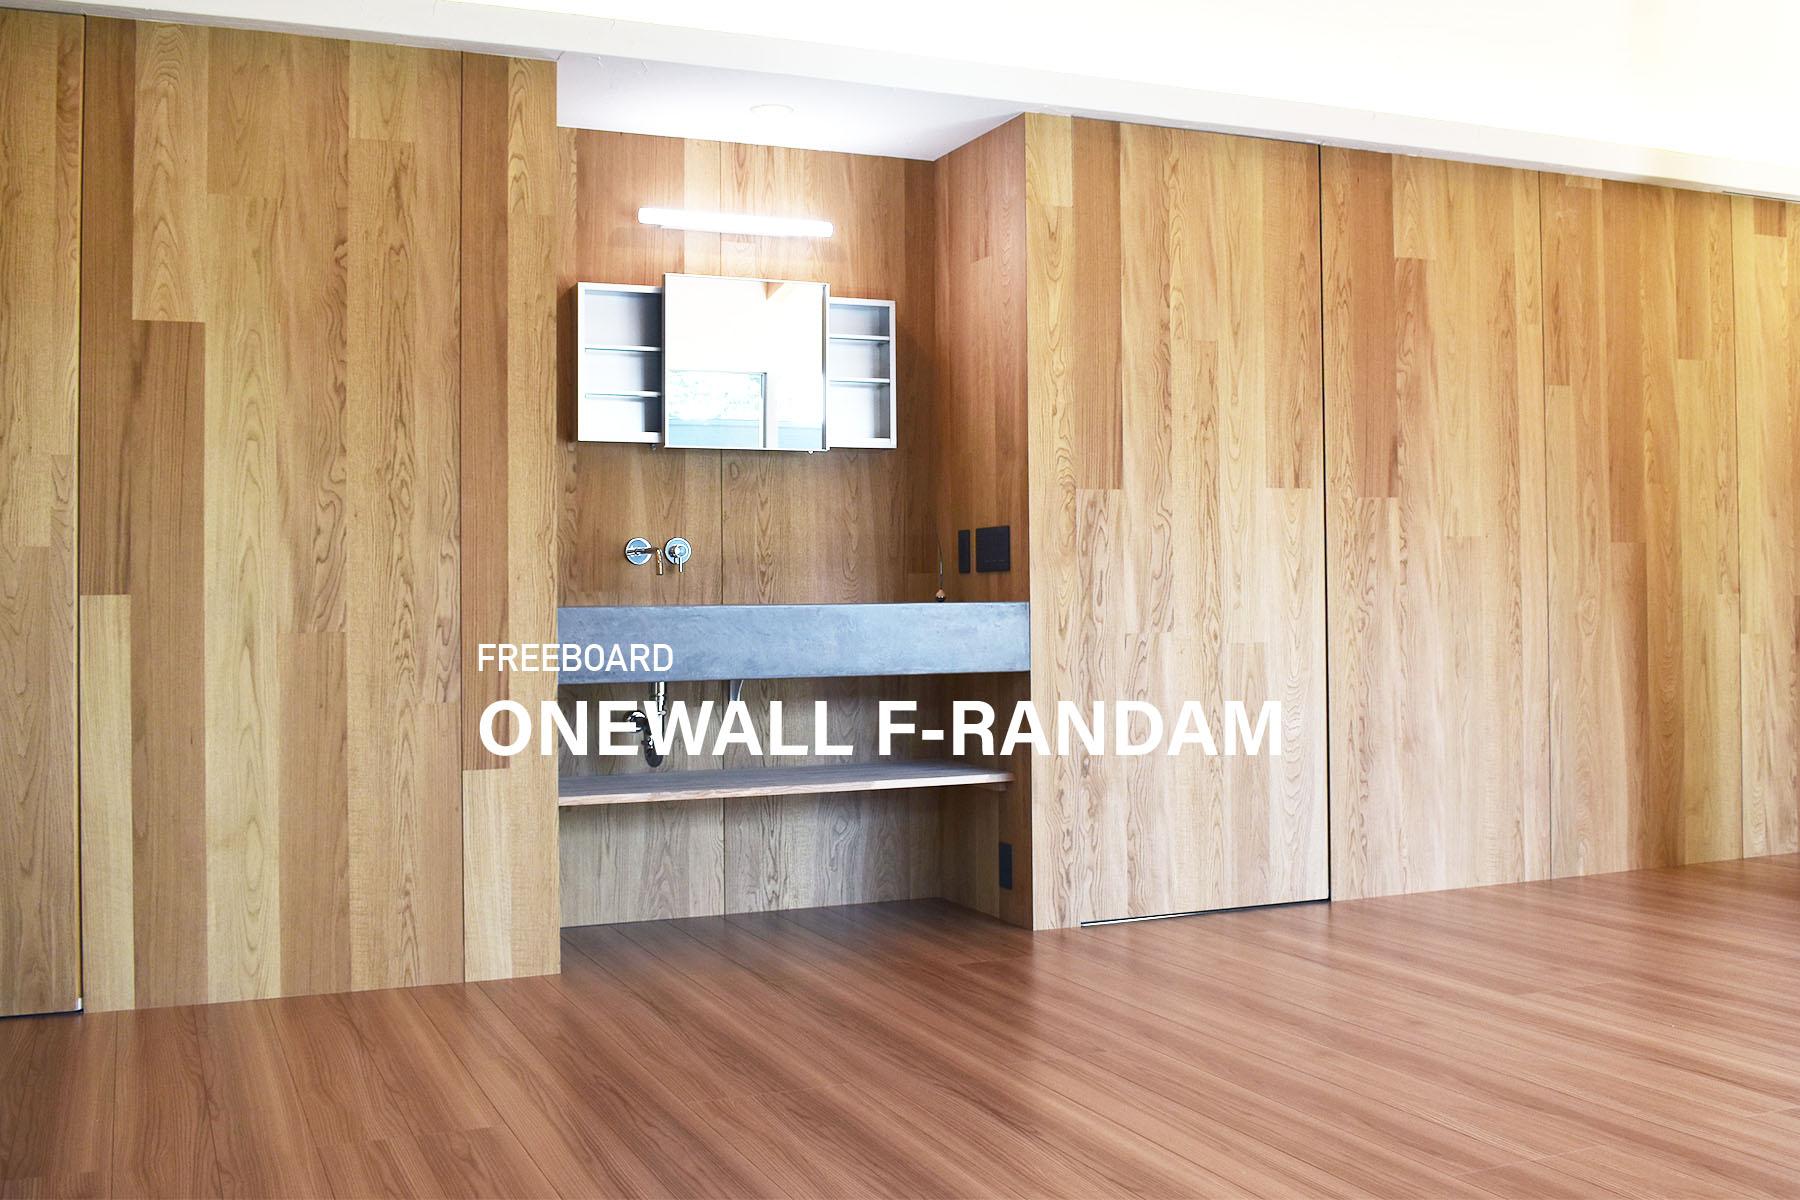 ONEWALL F-RANDAM